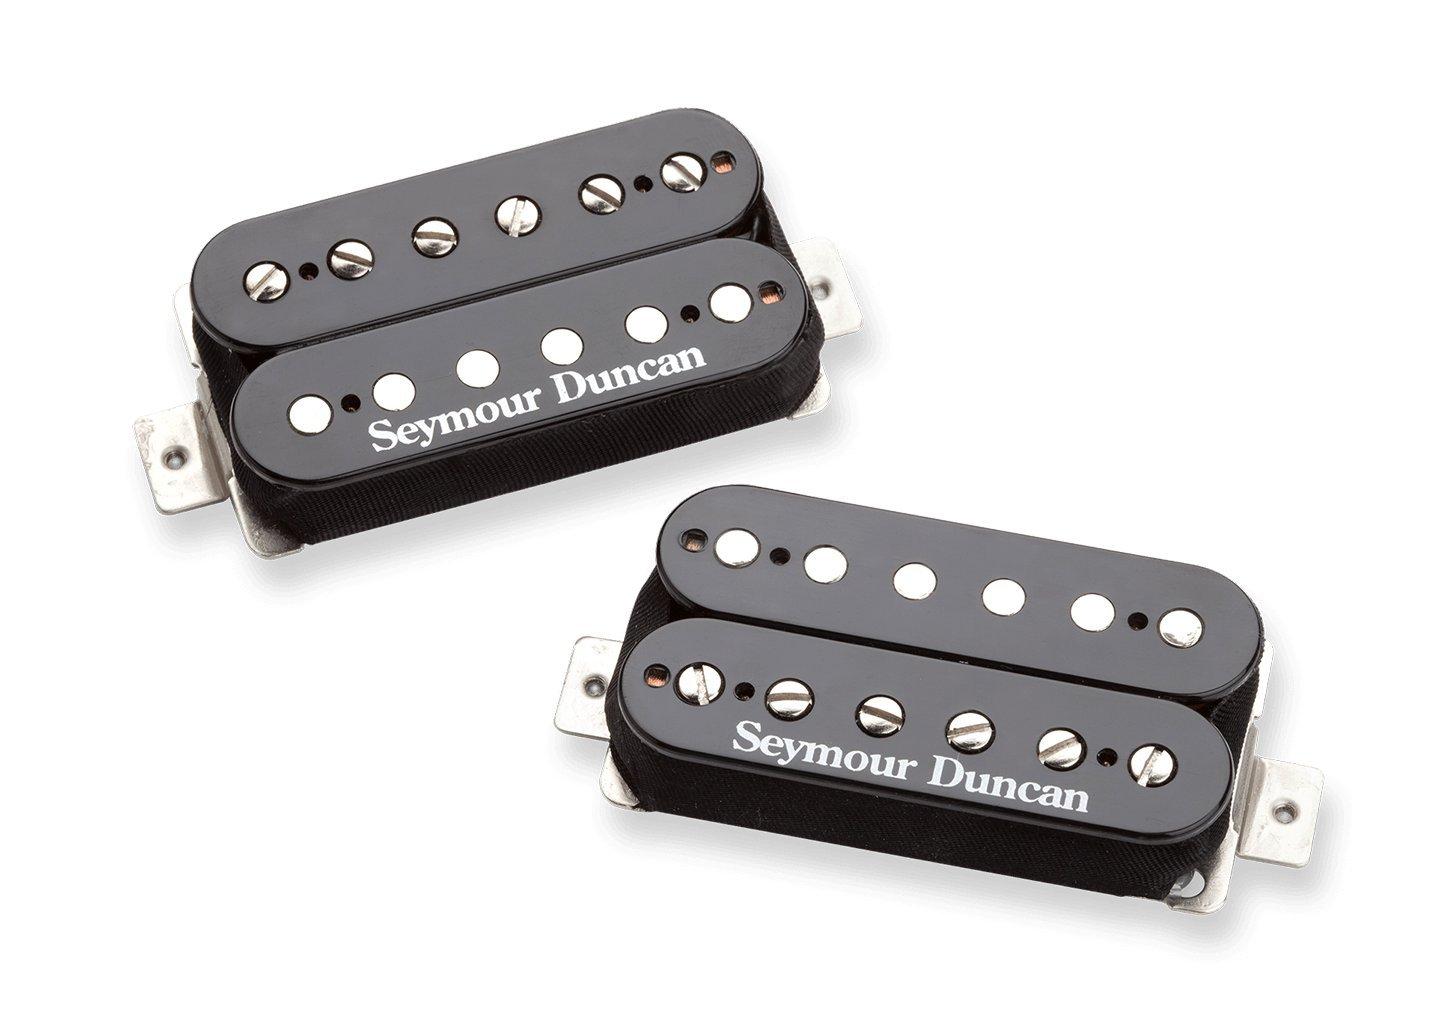 Seymour Duncan Hot Rodded Humbucker Matched Guitar Hondo Wiring Diagram Pickup Set With True Tune Tuner Dunlop Care Kit Fender Picks Sh 4b Musical Instruments